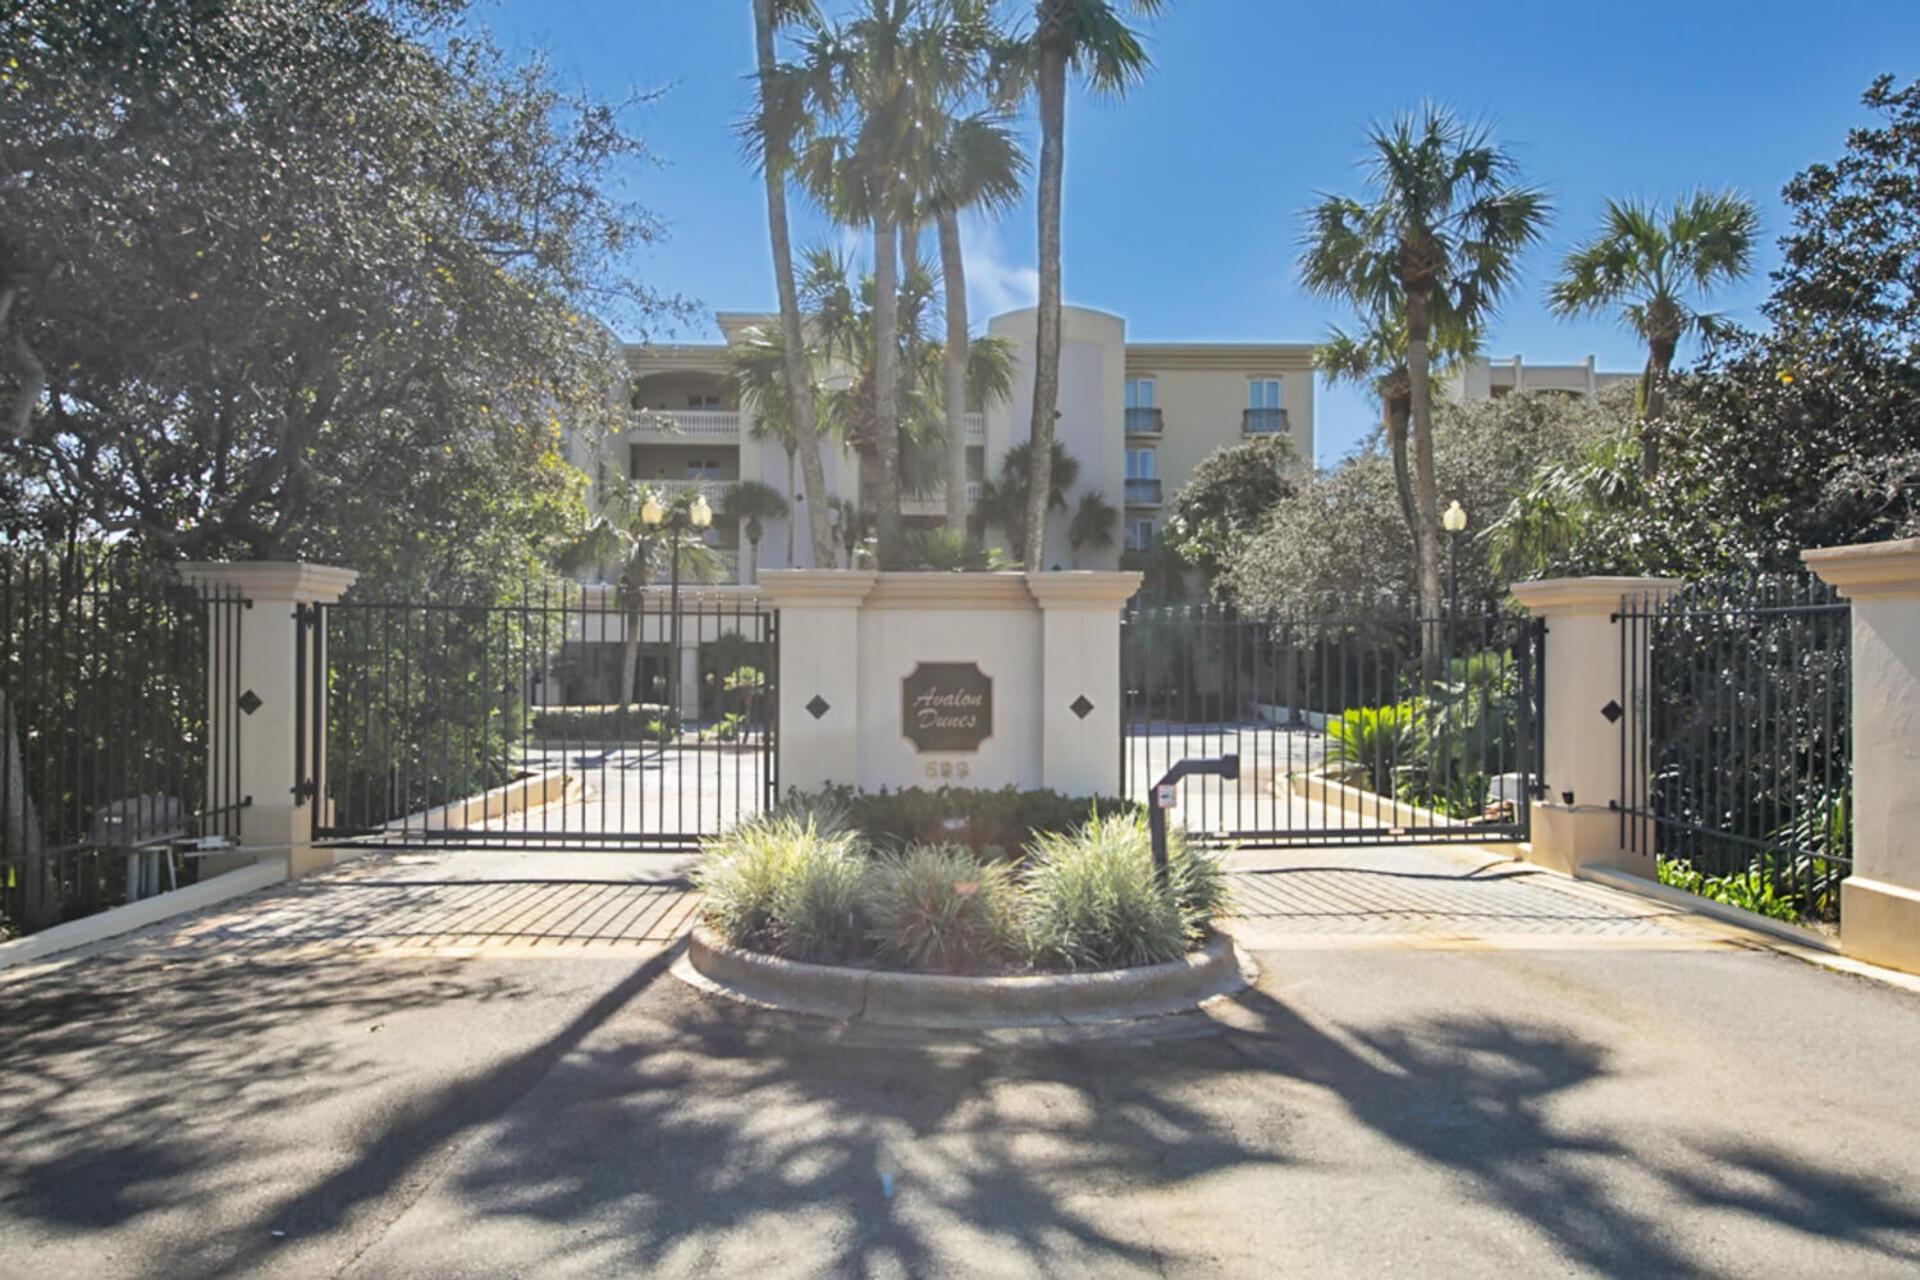 Photo of home for sale at 599 Scenic Gulf, Miramar Beach FL